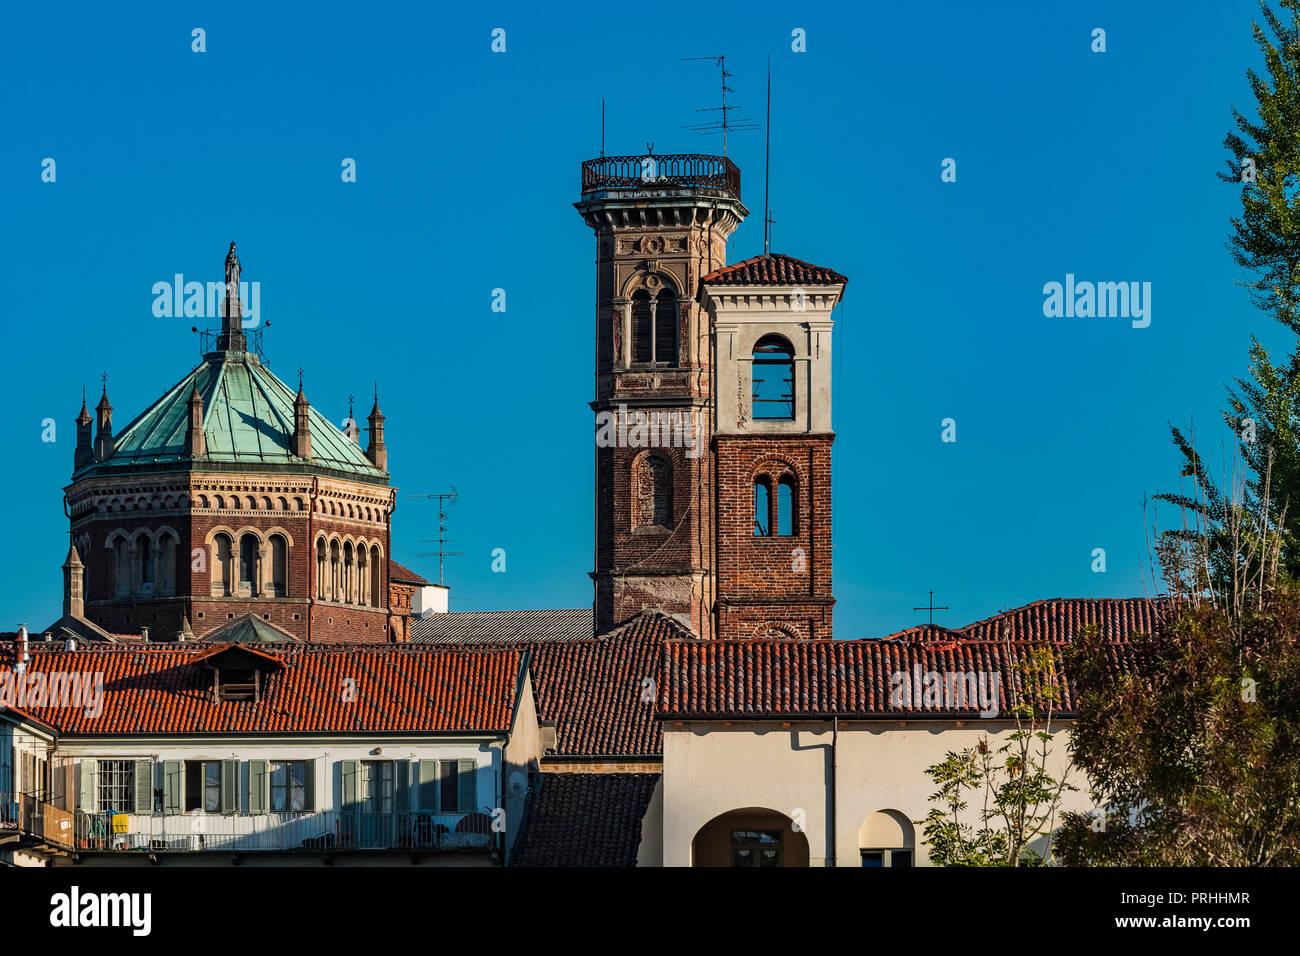 Italy Piedmont Vercelli Parish Church of S. Bernardo and the Madonna degli Infermi - Stock Image